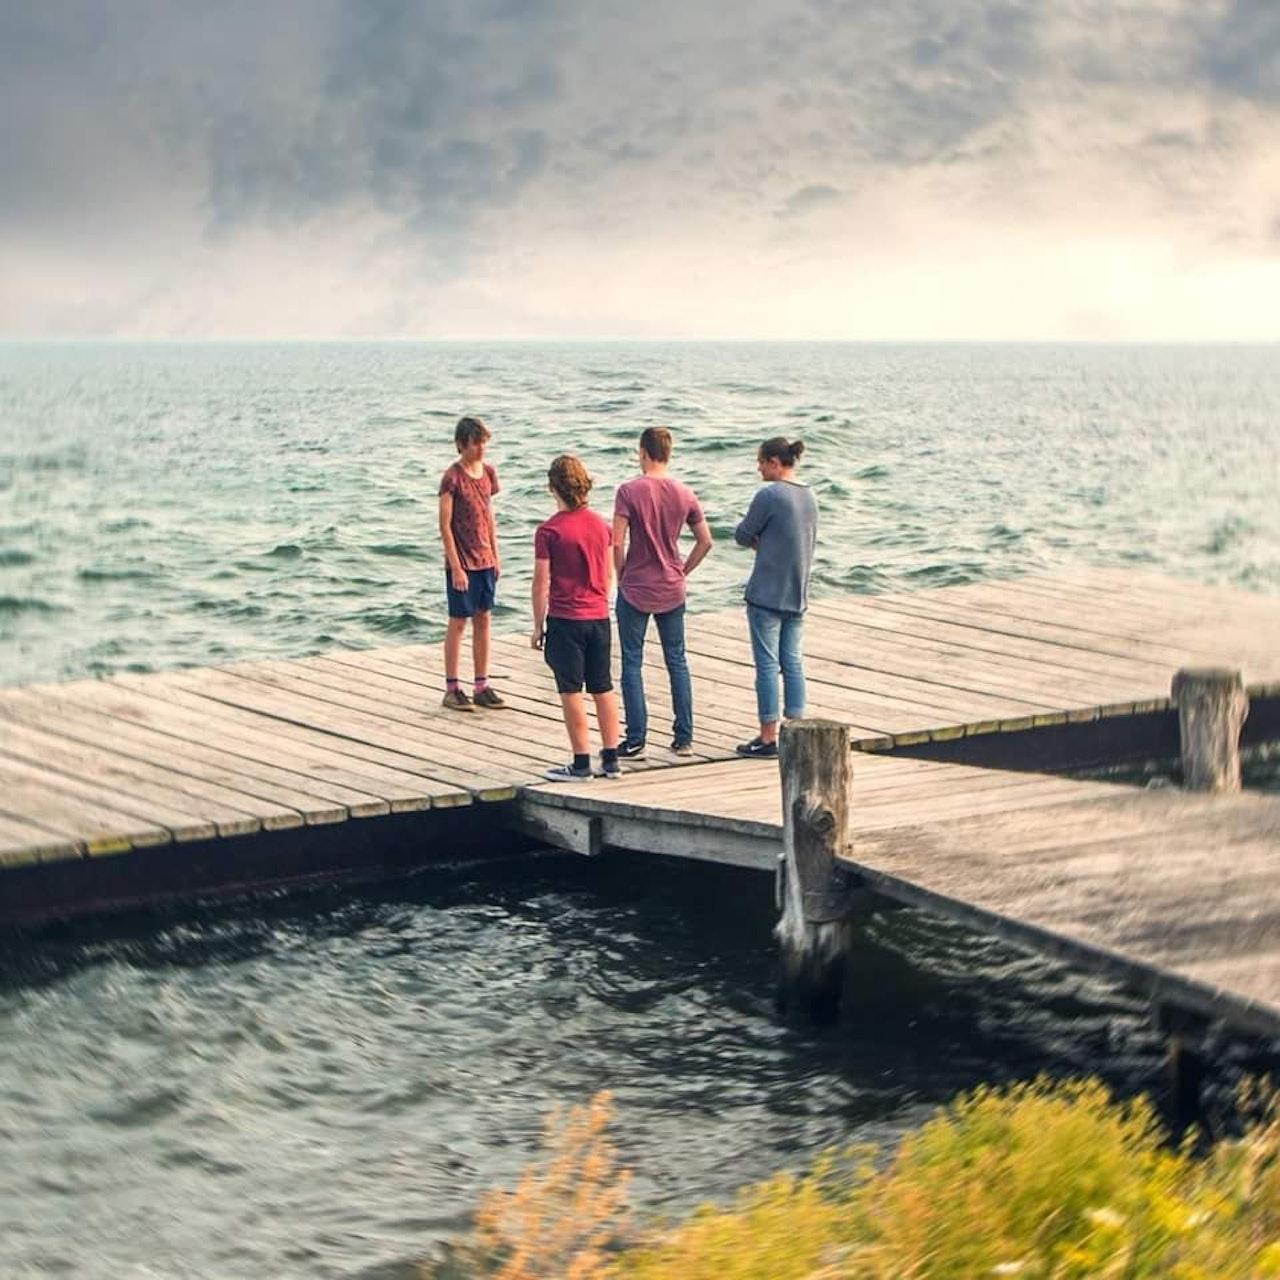 Boys, Men & the Campside